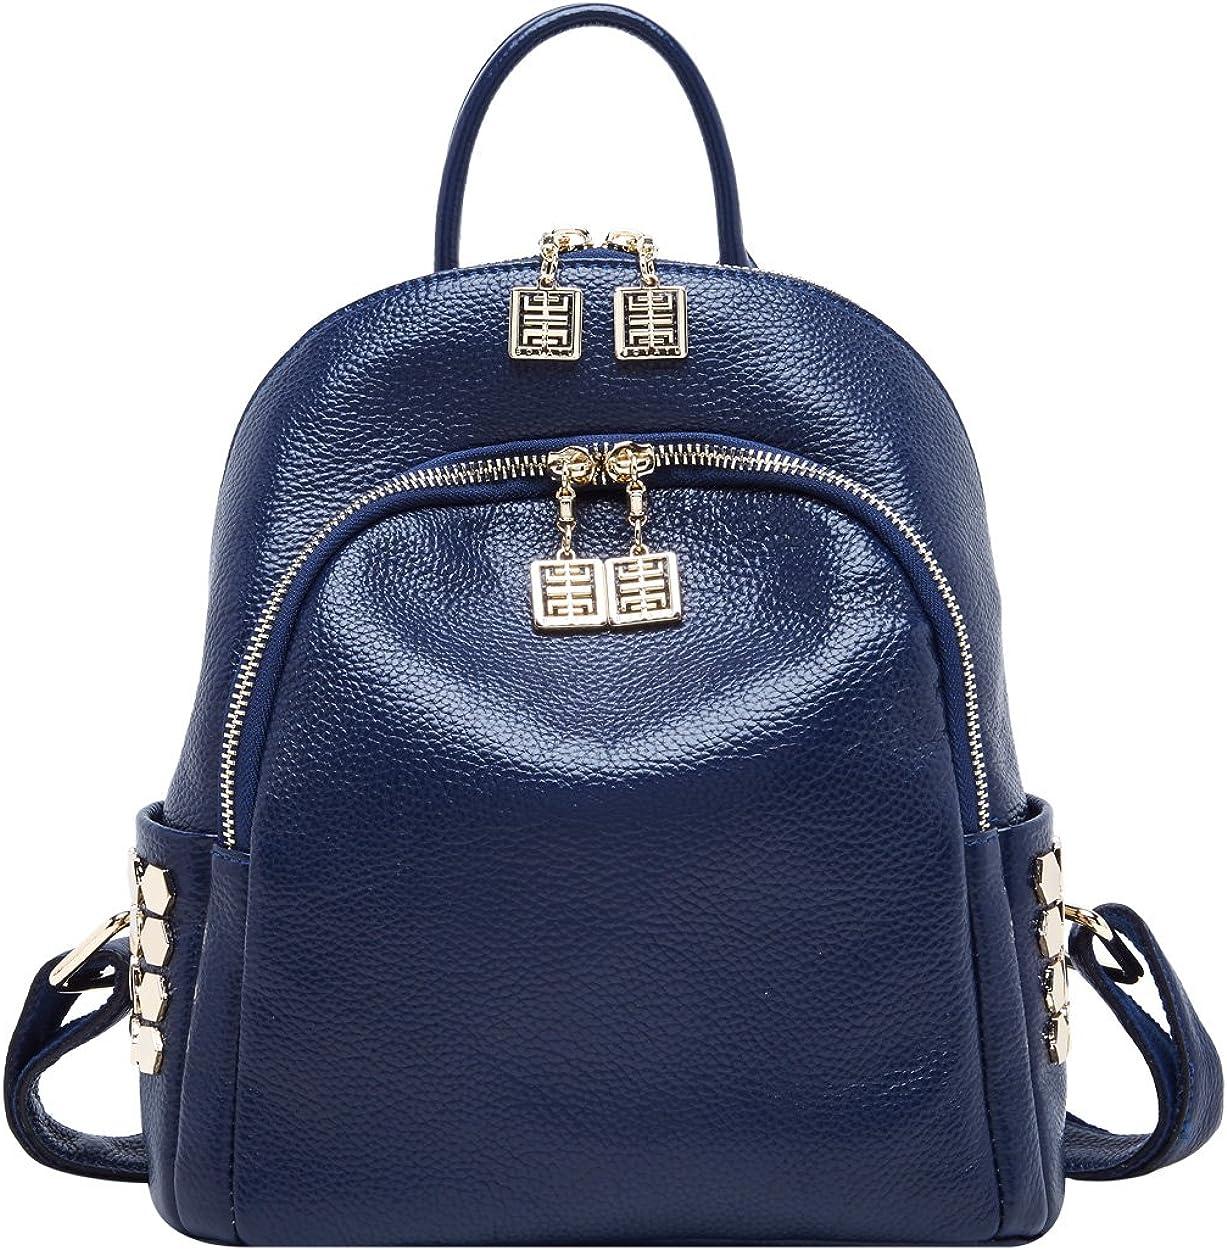 BOYATU Genuine Leather Backpack for Women Designer Mini Backpack Purse Stylish Bag